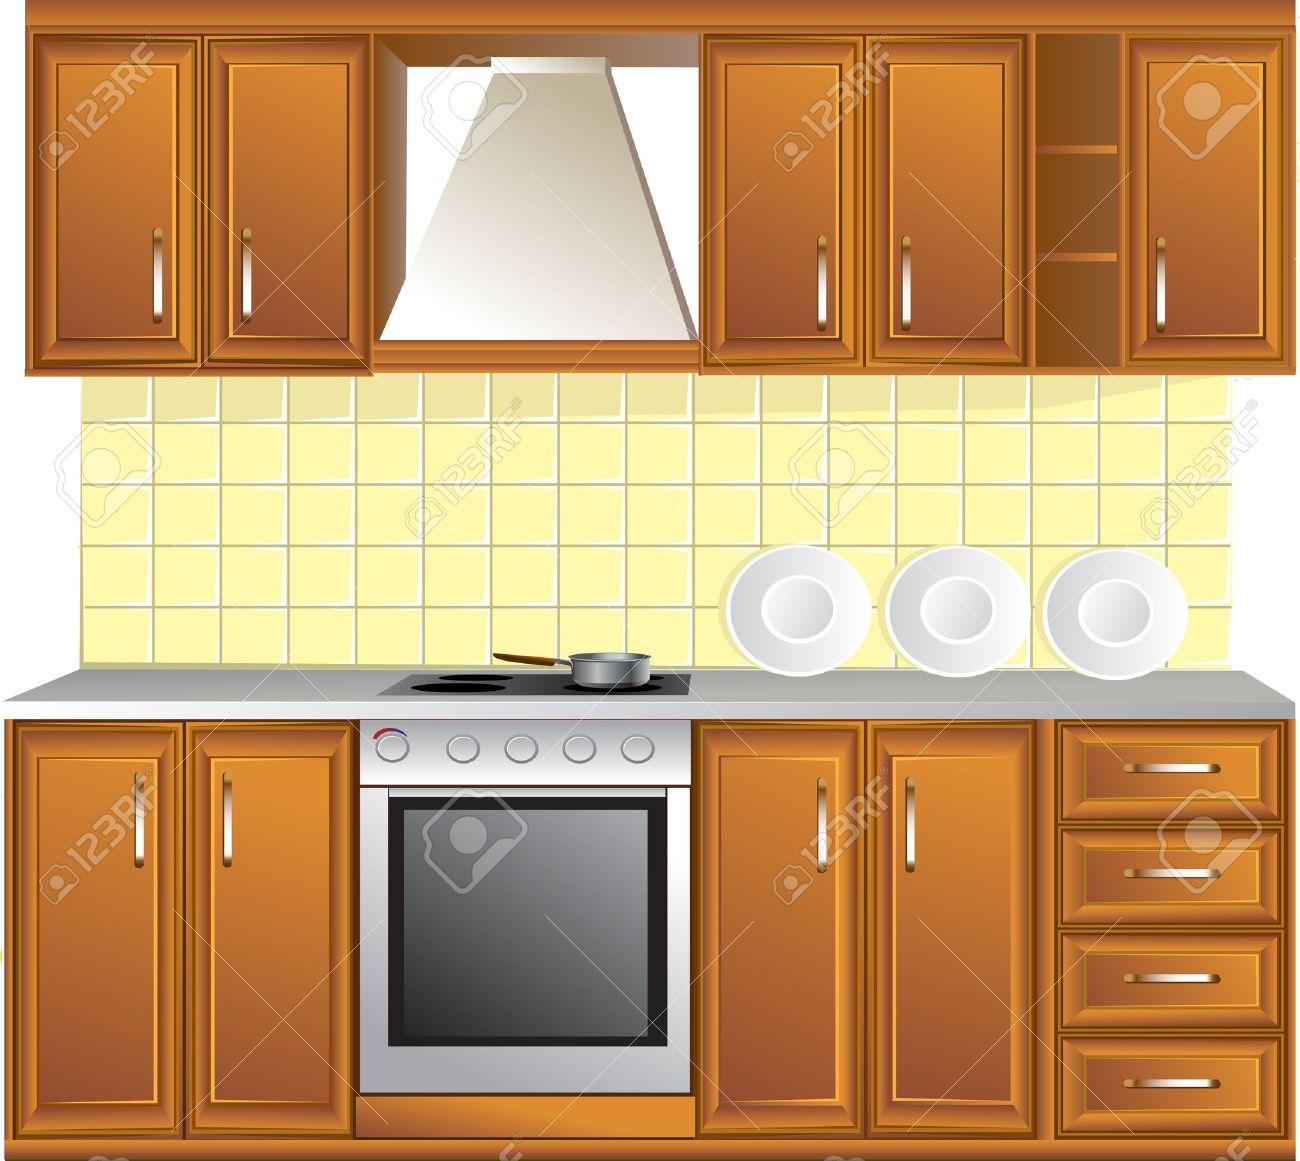 Open Kitchen Cabinet Clipart.